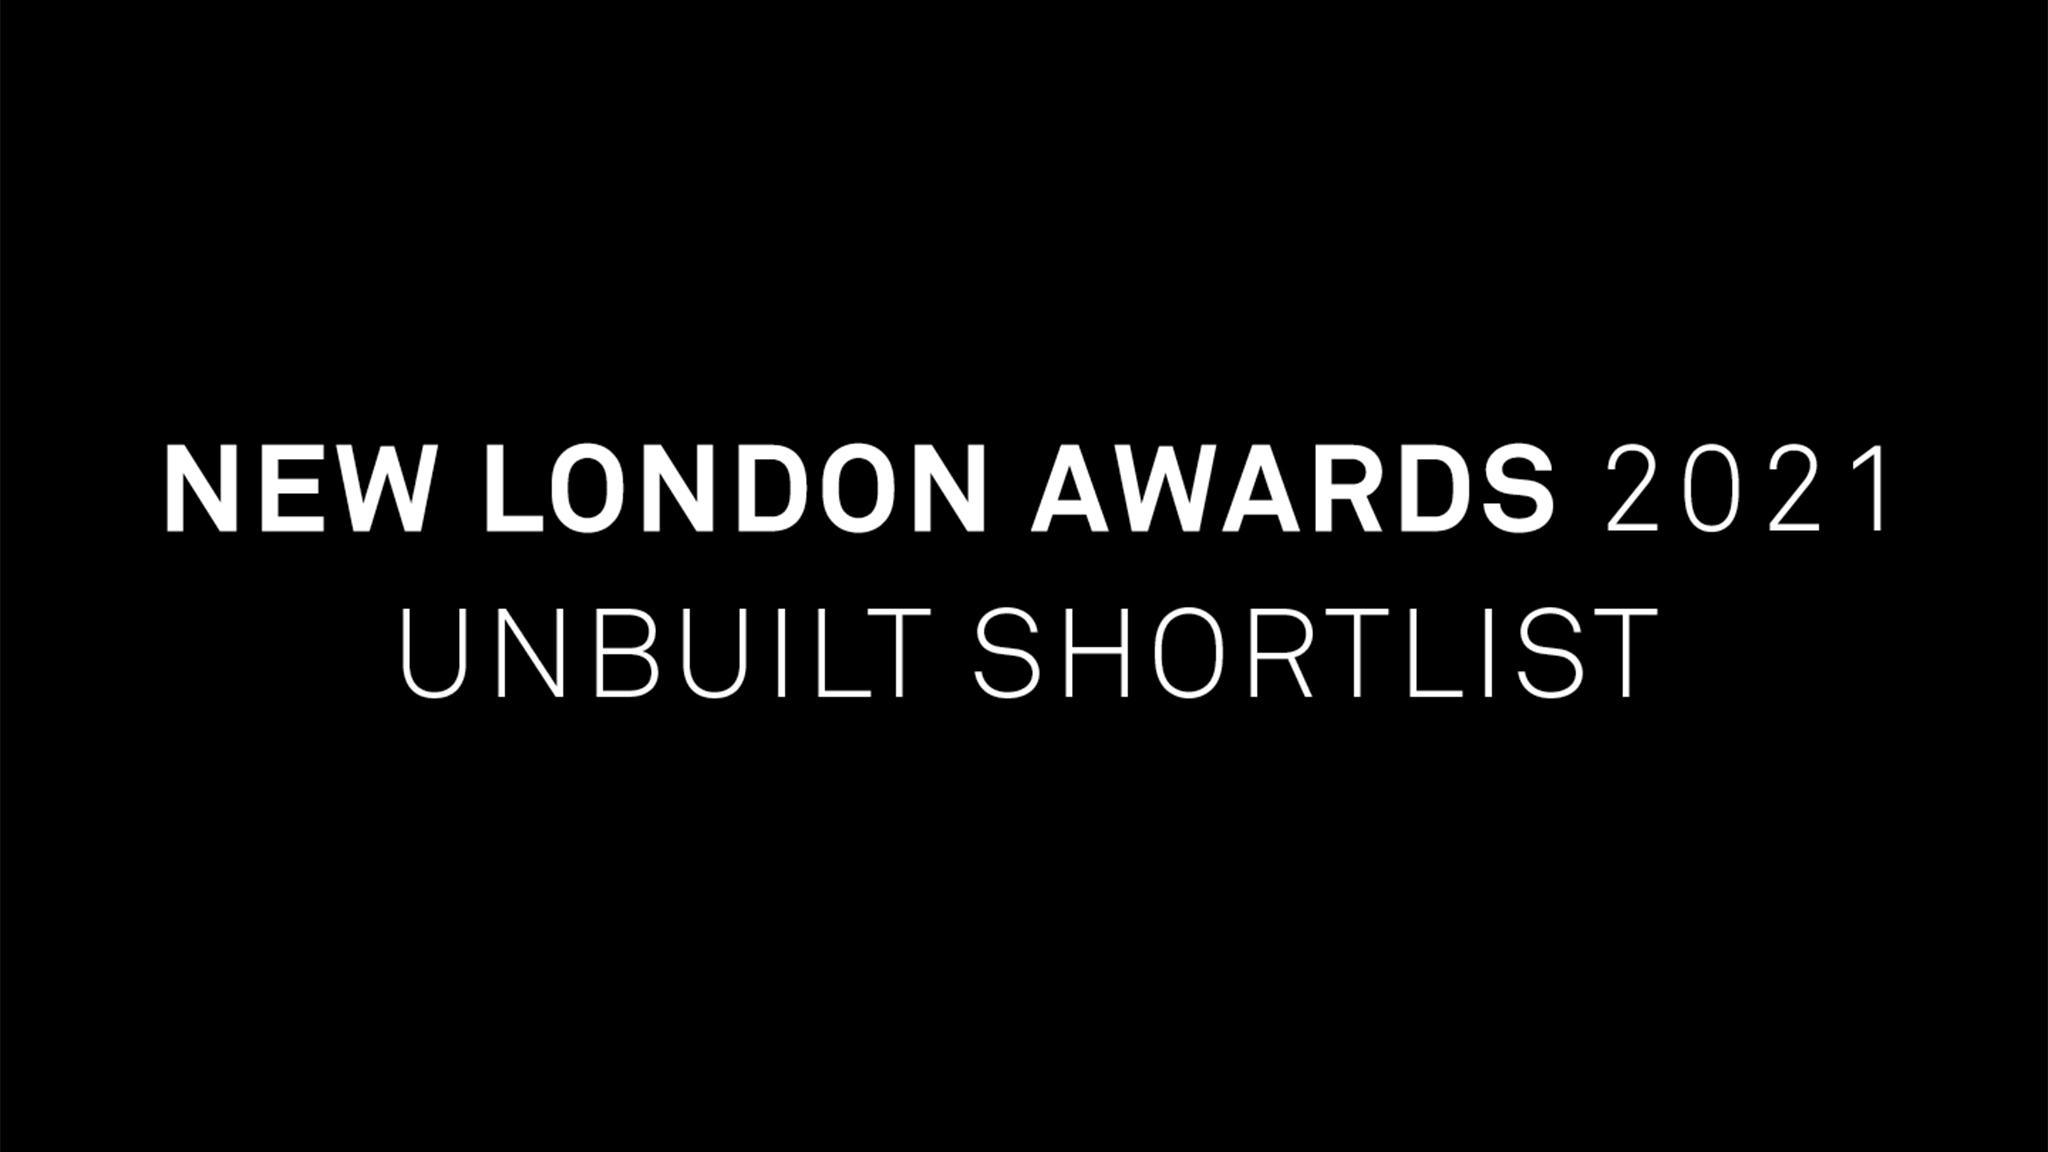 New London Awards 2021 - UNBUILT Shortlist